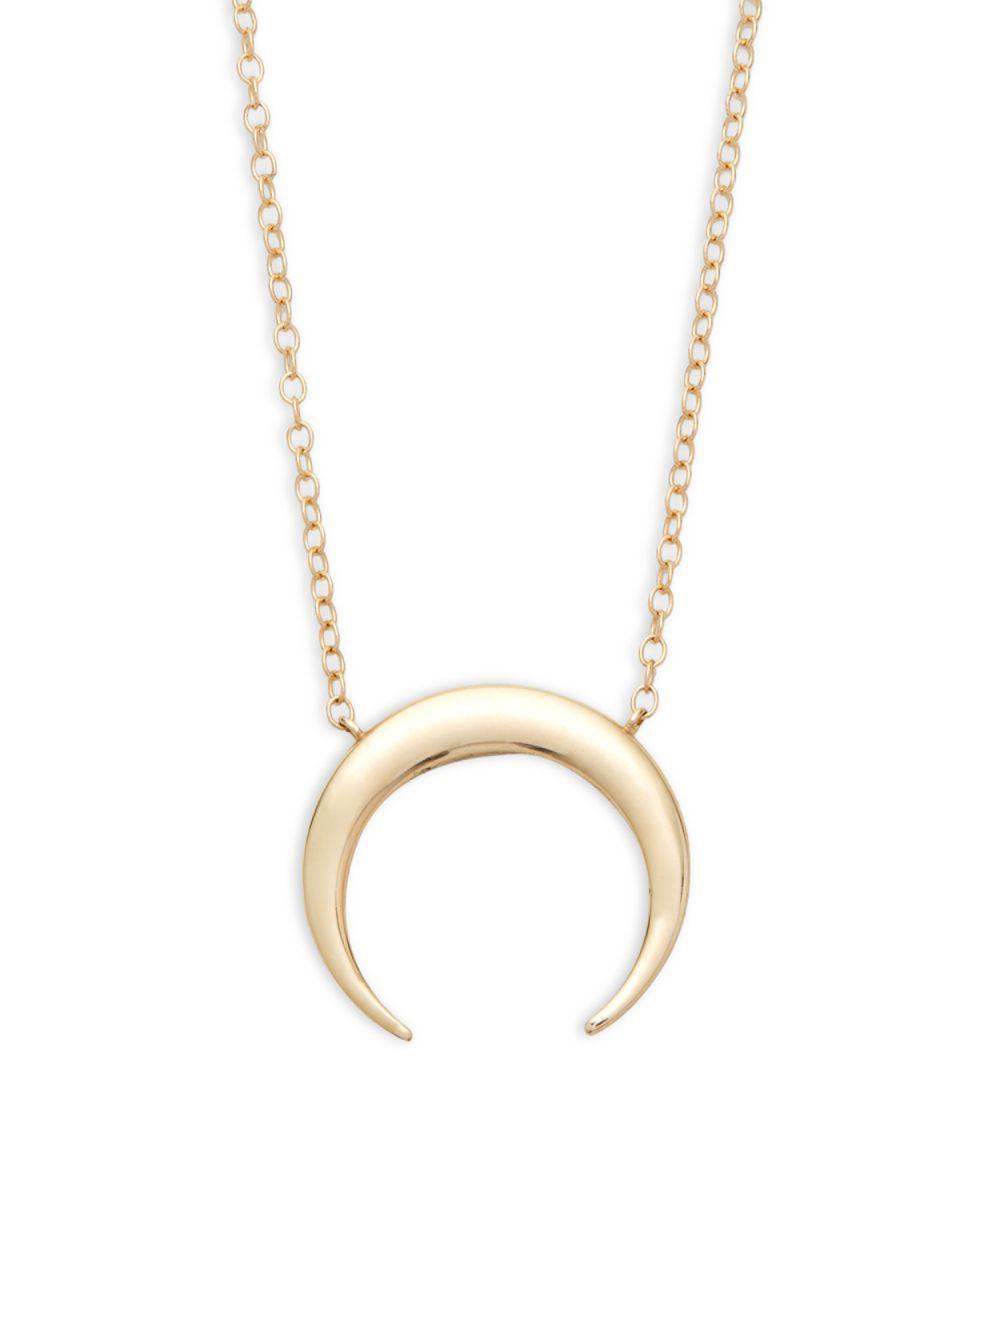 Lyst saks fifth avenue 14k gold half moon pendant necklace in saks fifth avenue womens metallic 14k gold half moon pendant necklace aloadofball Images